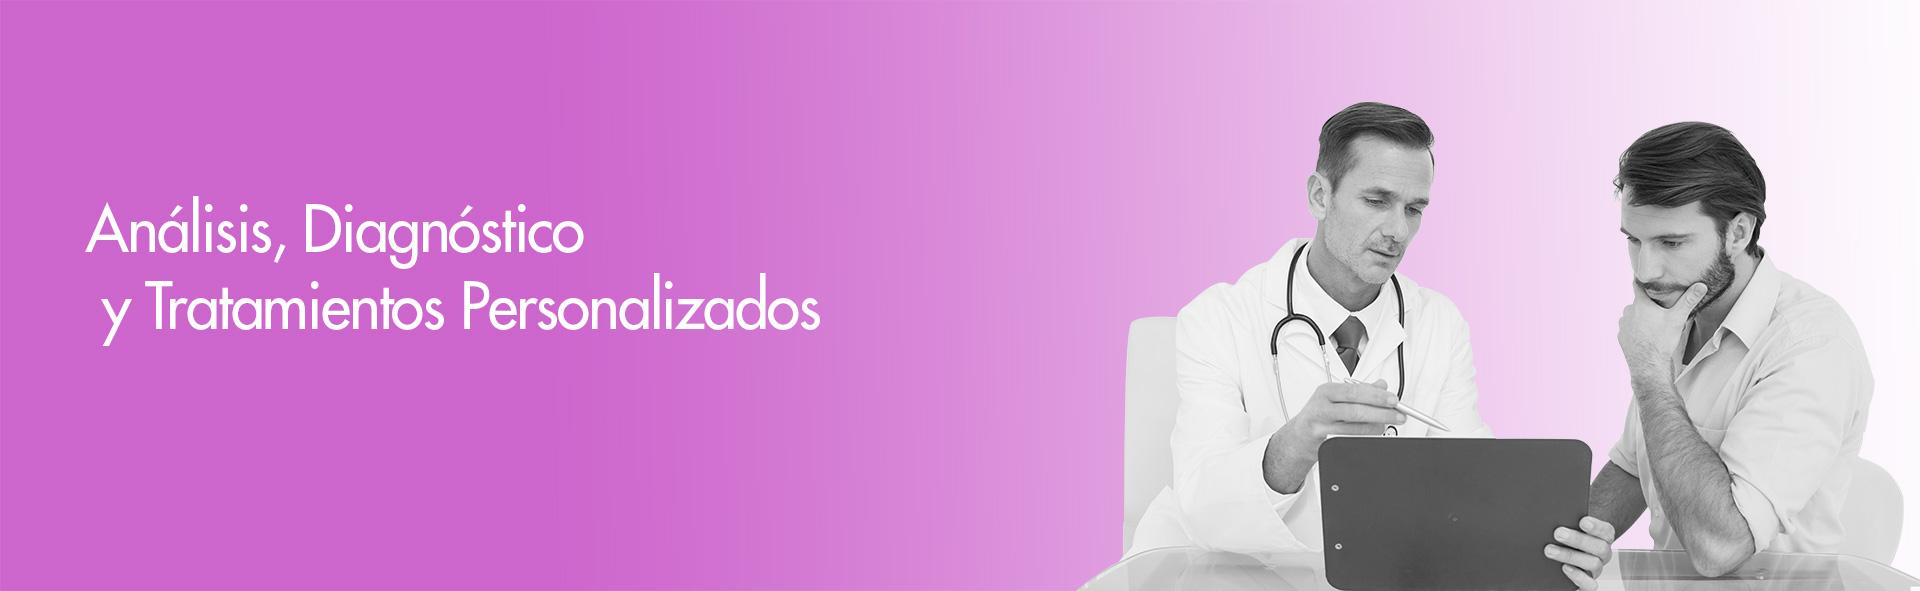 banner consulta hombre